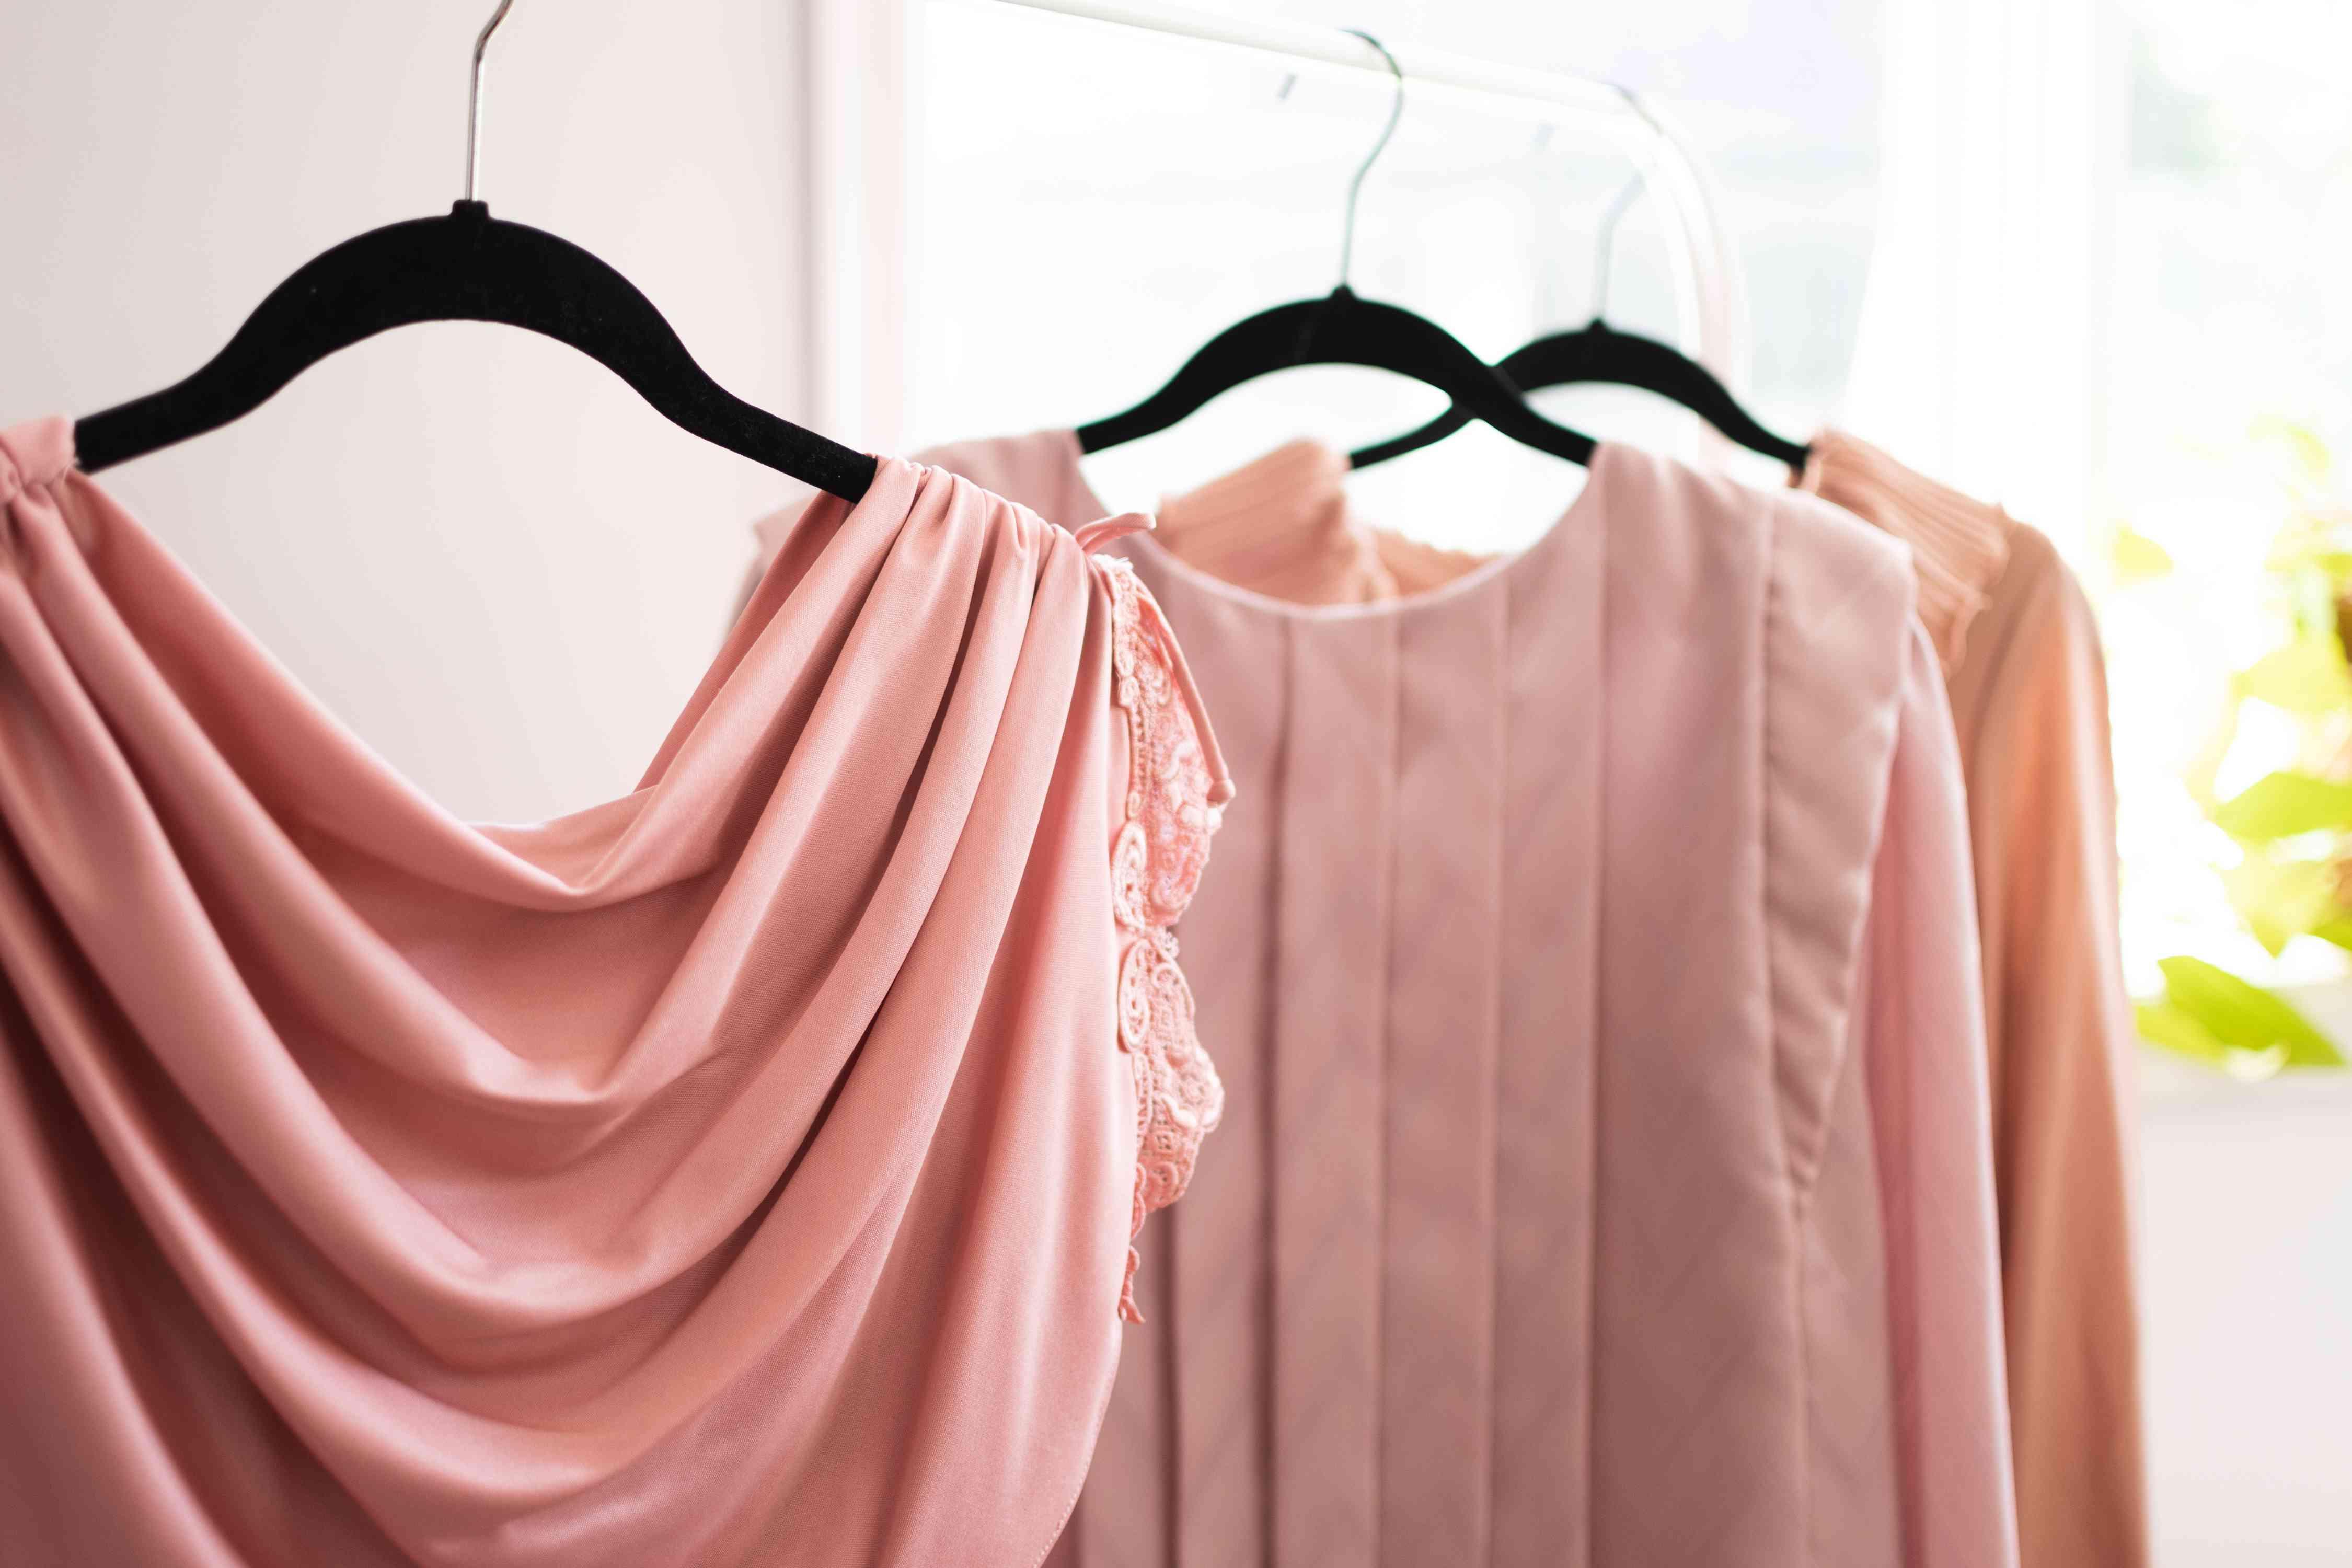 Pink acetate blouses hanging on black hangers